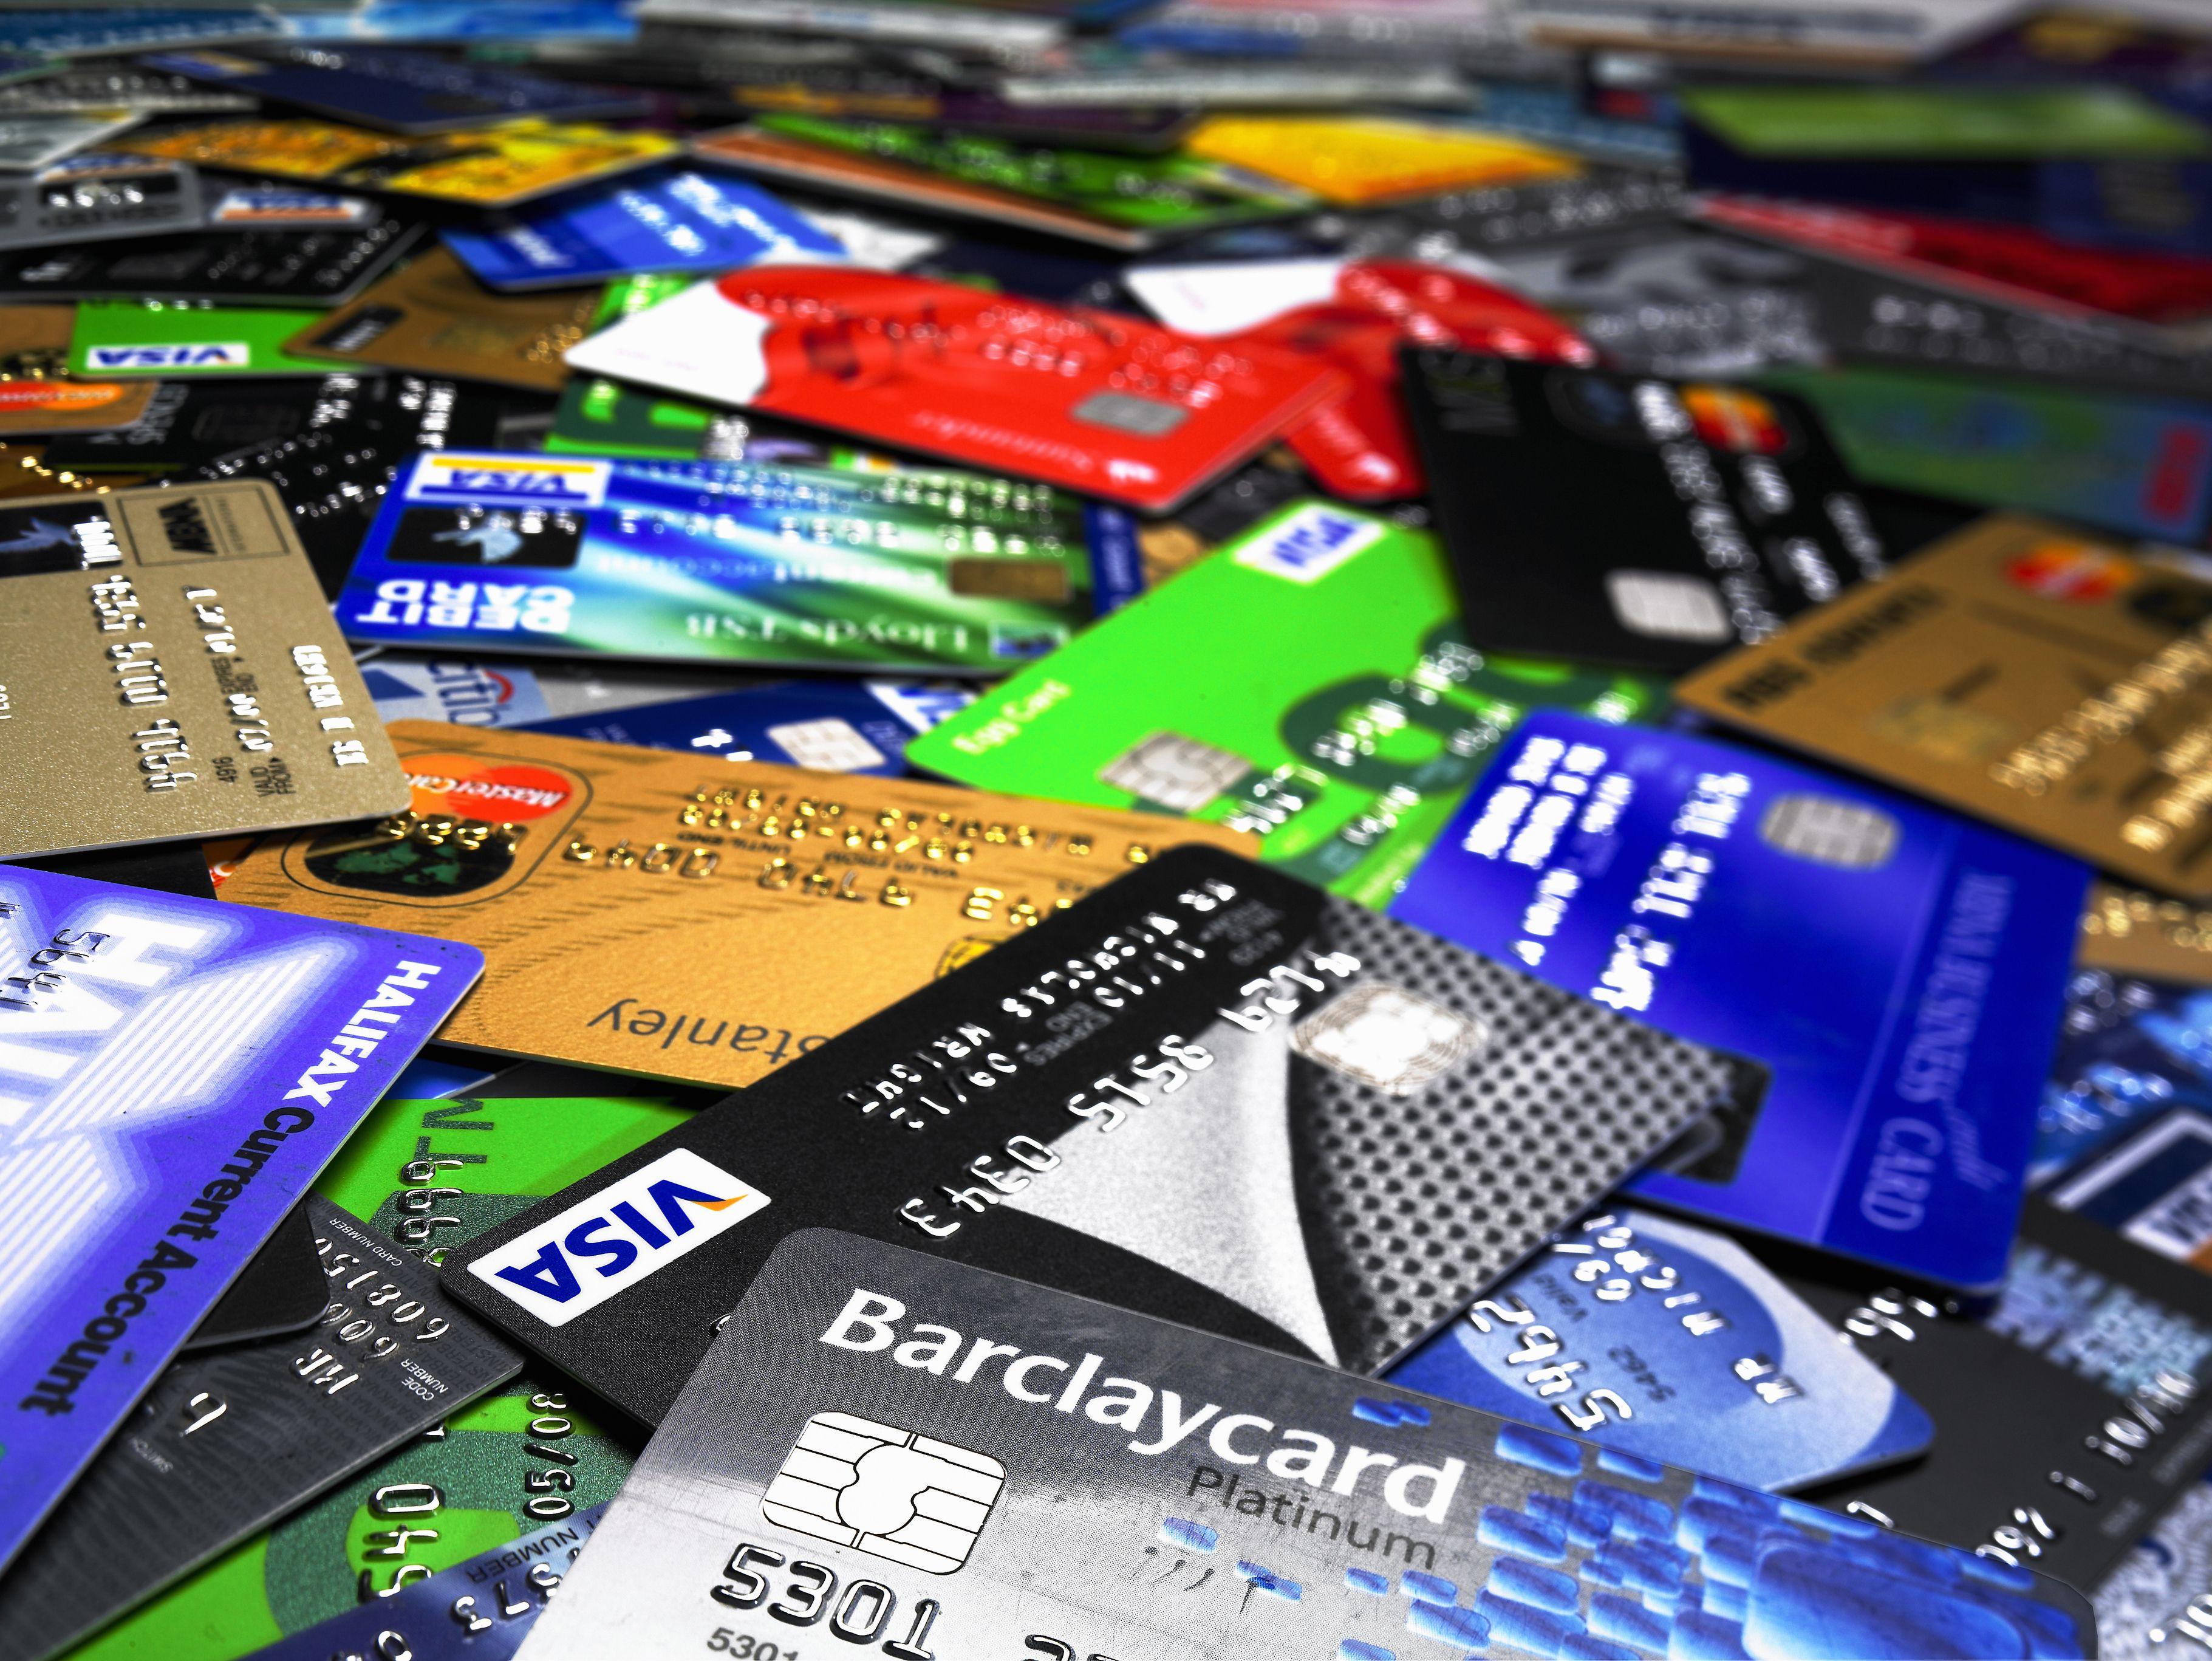 assorted-credit-cards-139830376-57746b6e3df78cb62c6eb4c6.jpg